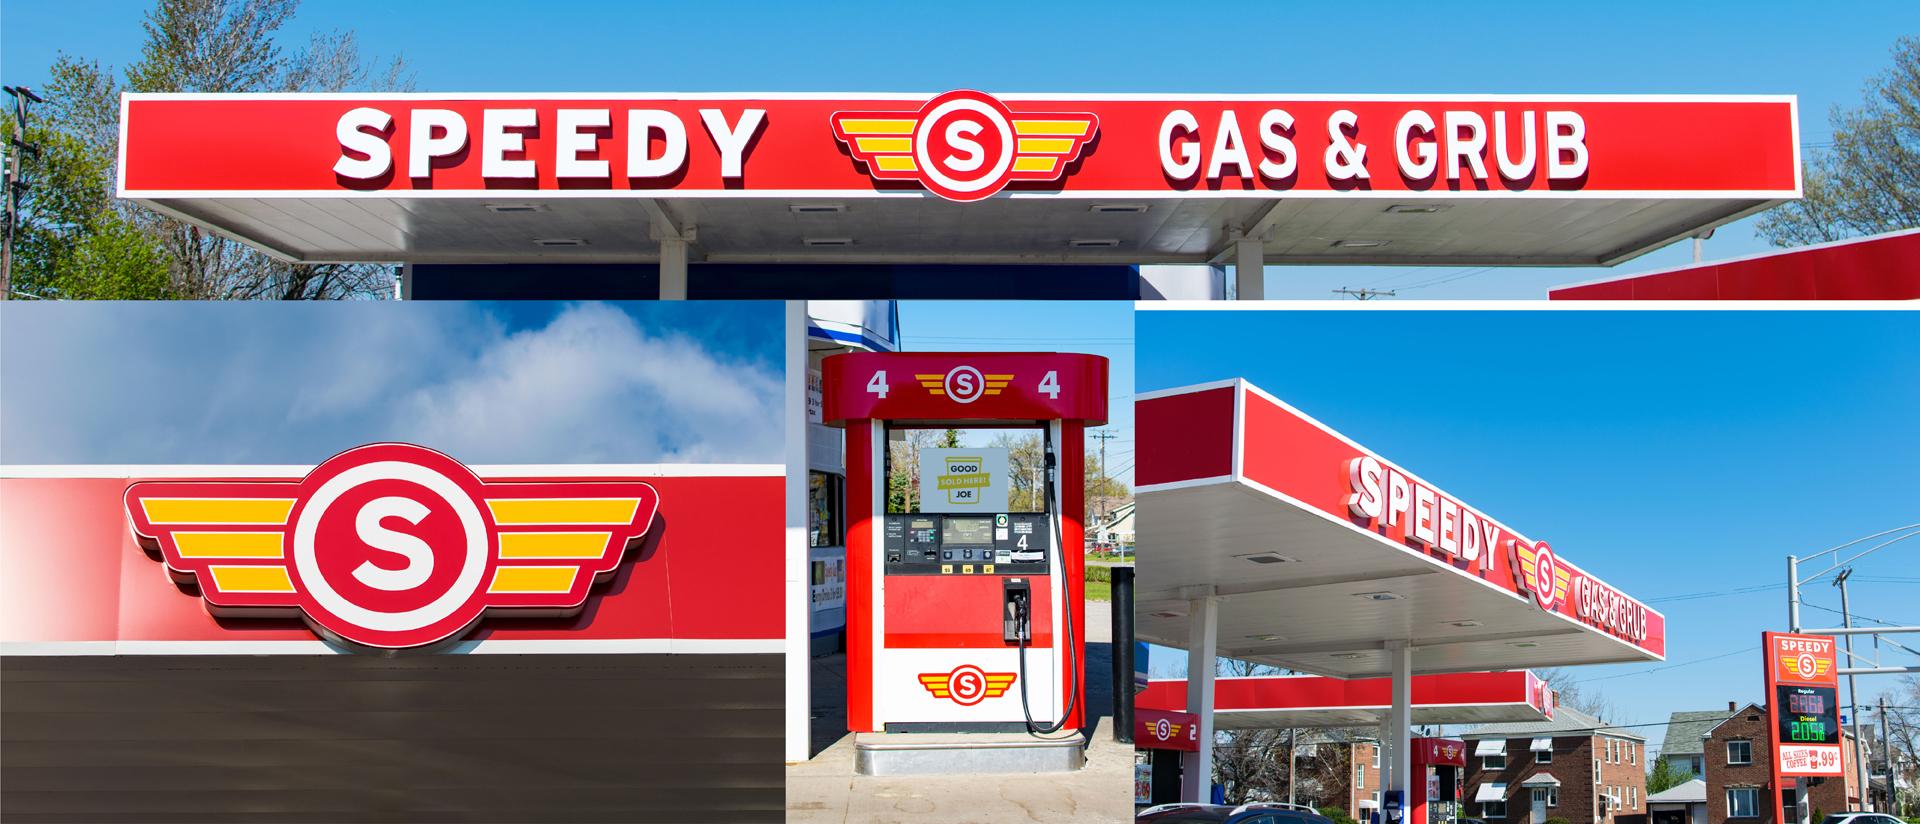 Speedy Gas Graphic Design Branding Real World In Progress